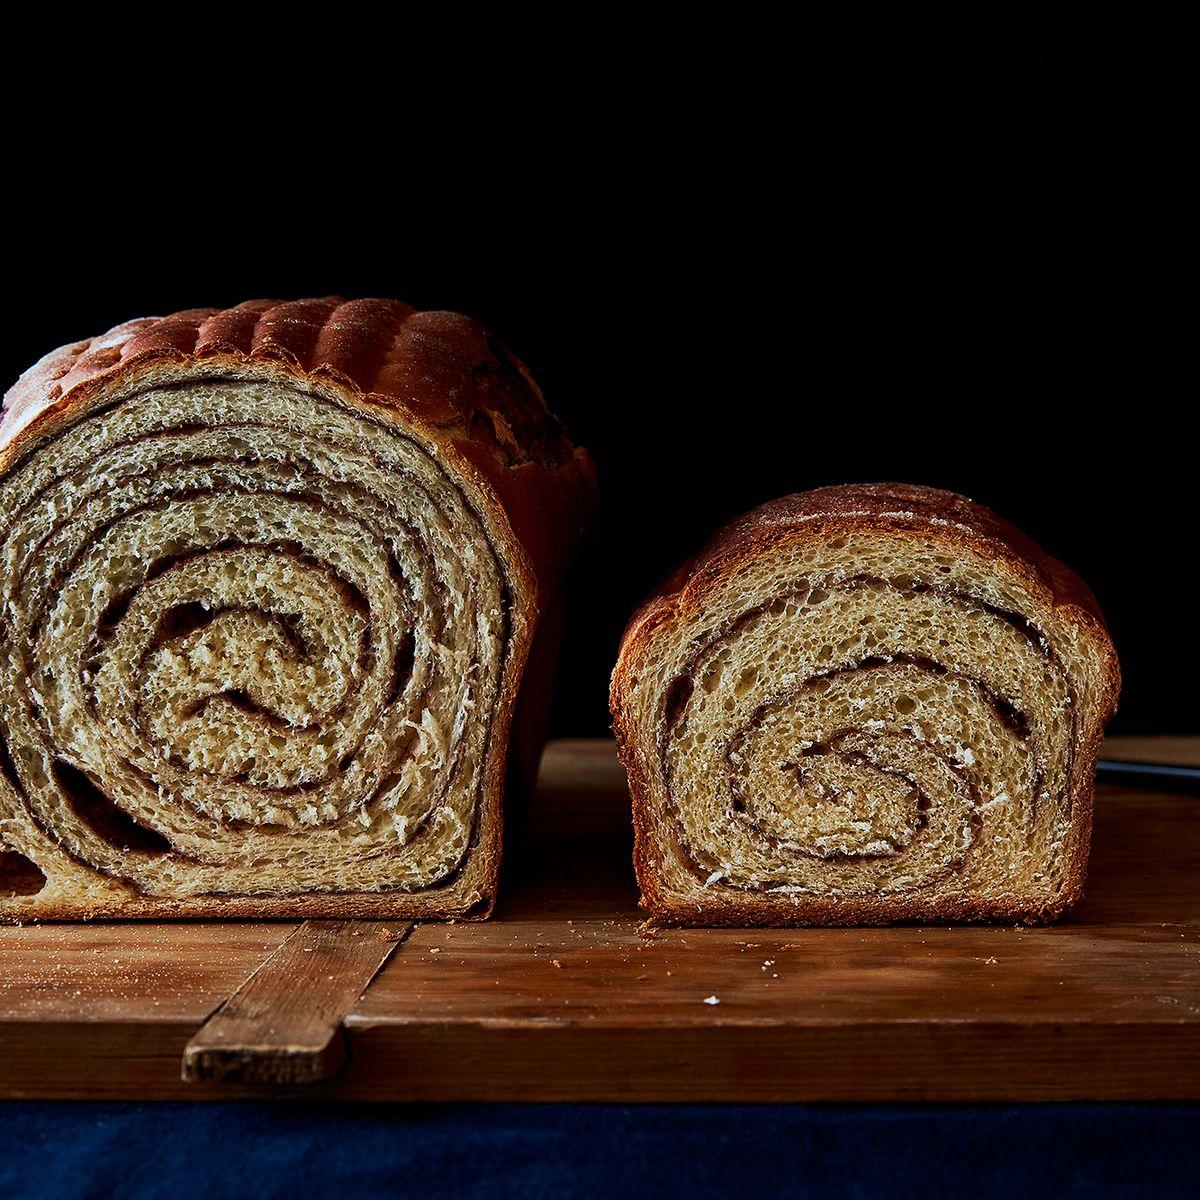 Best Cinnamon Bread Recipe How To Make Homemade Cinnamon Swirl Bread